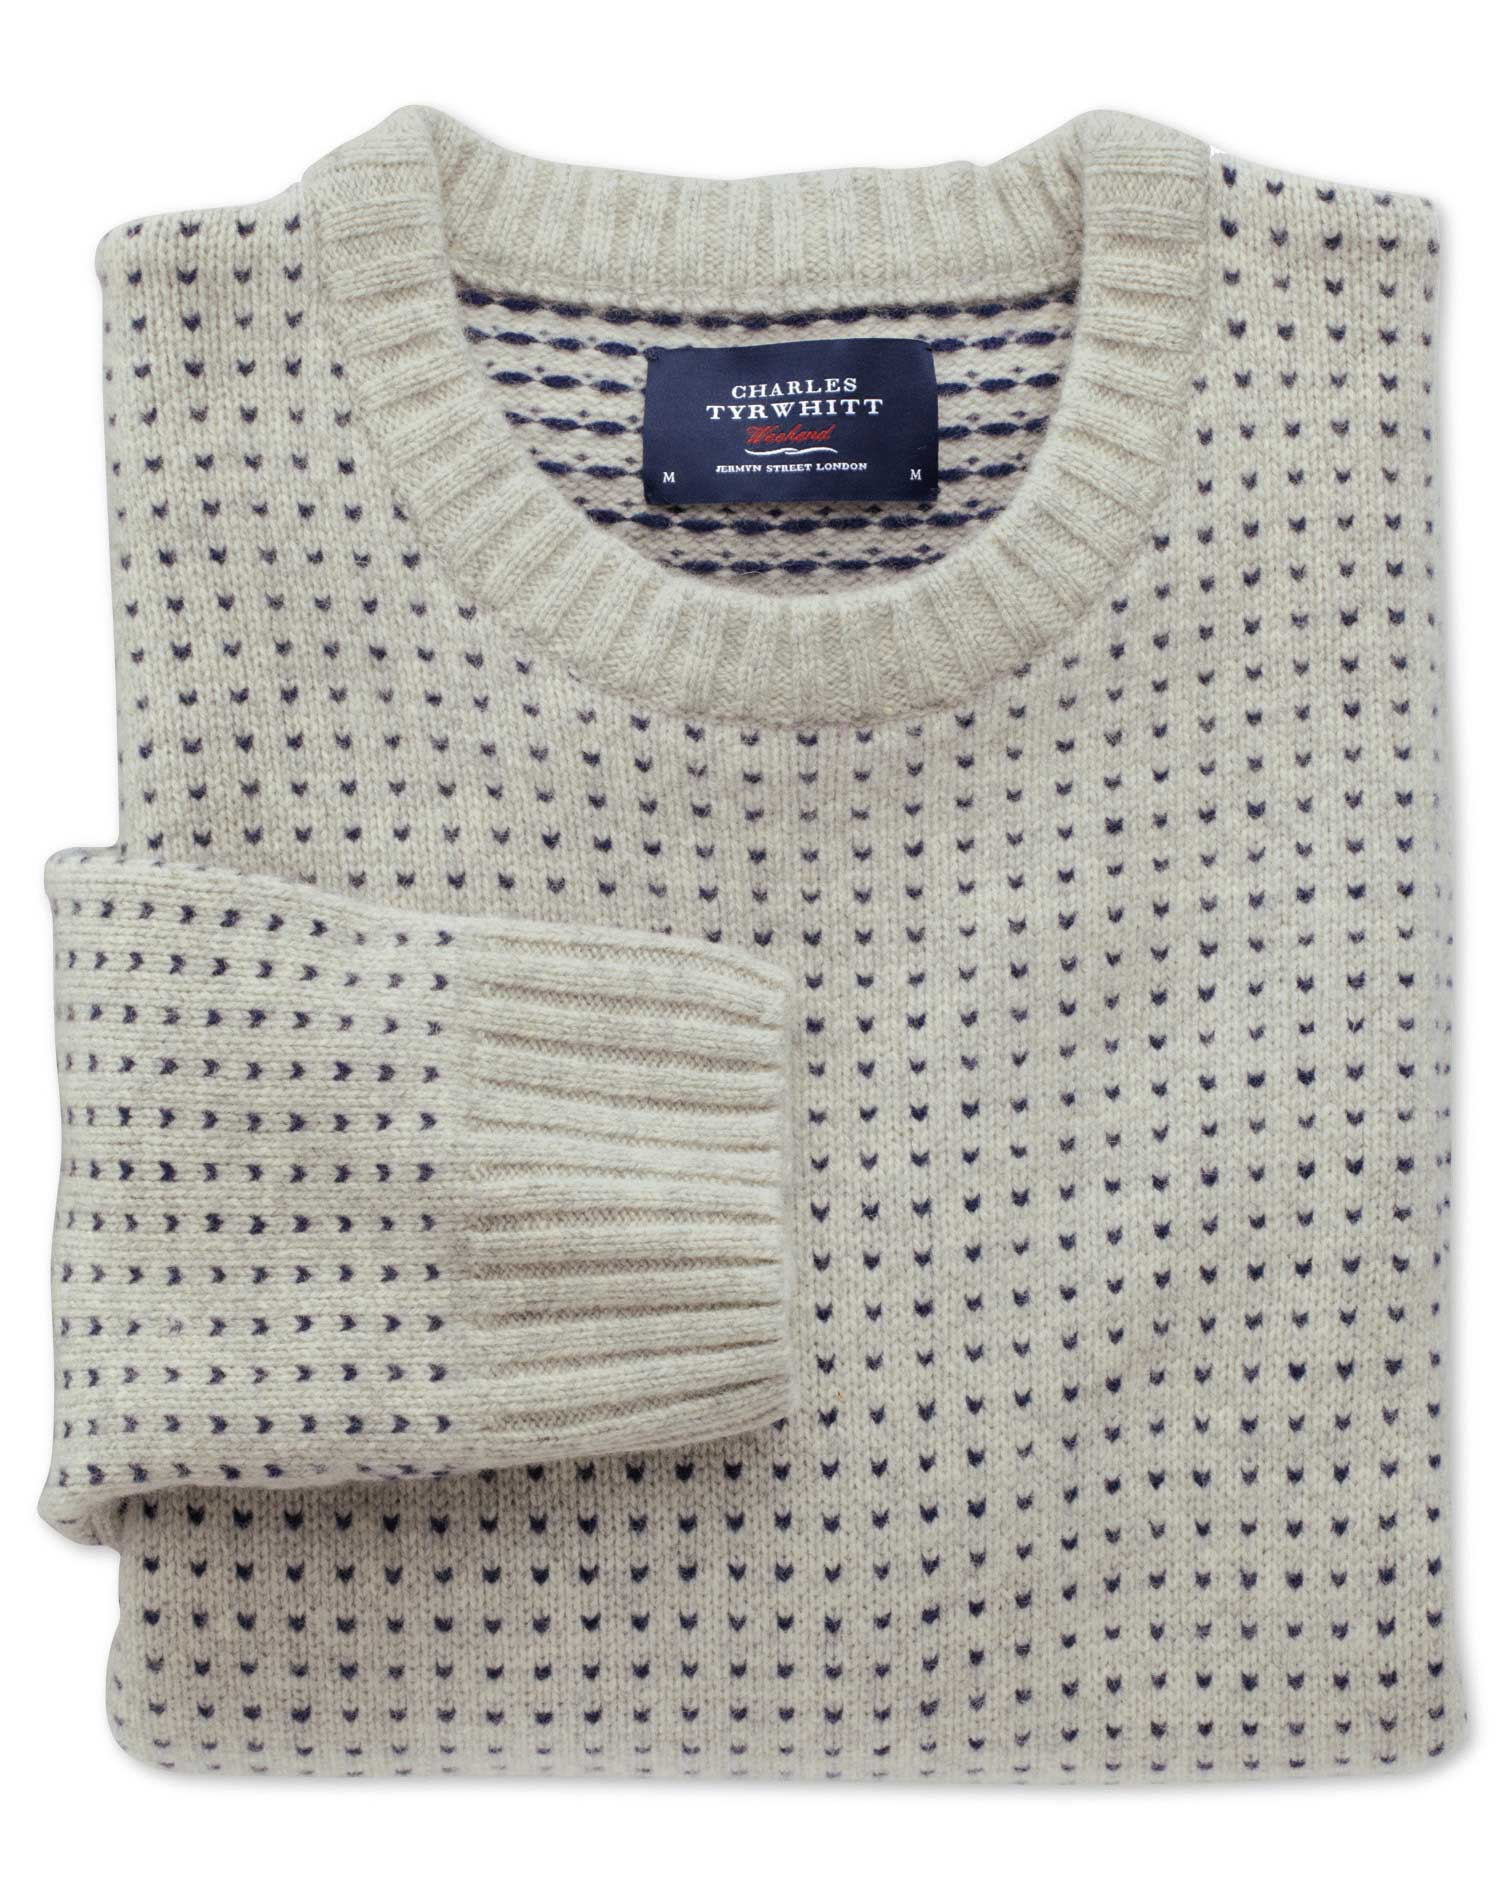 Beige Birdseye Crew Neck Wool Jumper Size XXL by Charles Tyrwhitt